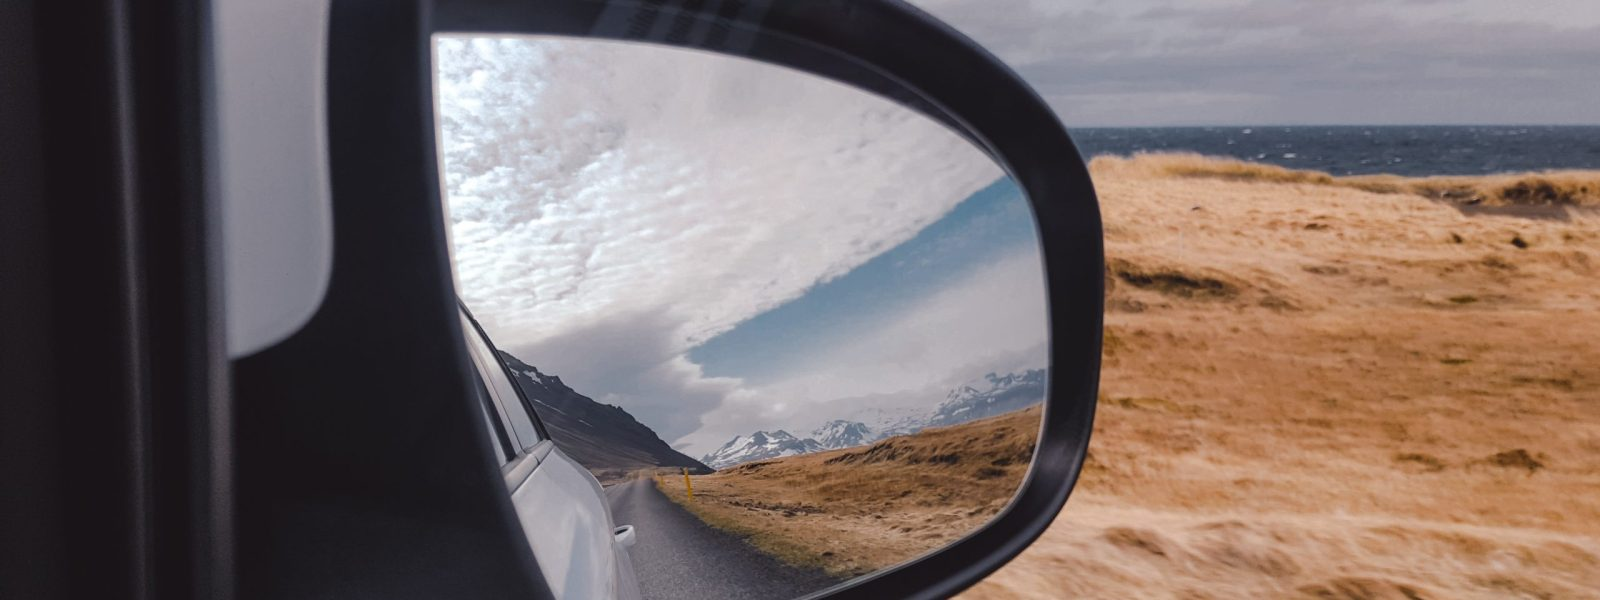 De mooiste plekken in IJsland: 10 must-see bezienswaardigheden